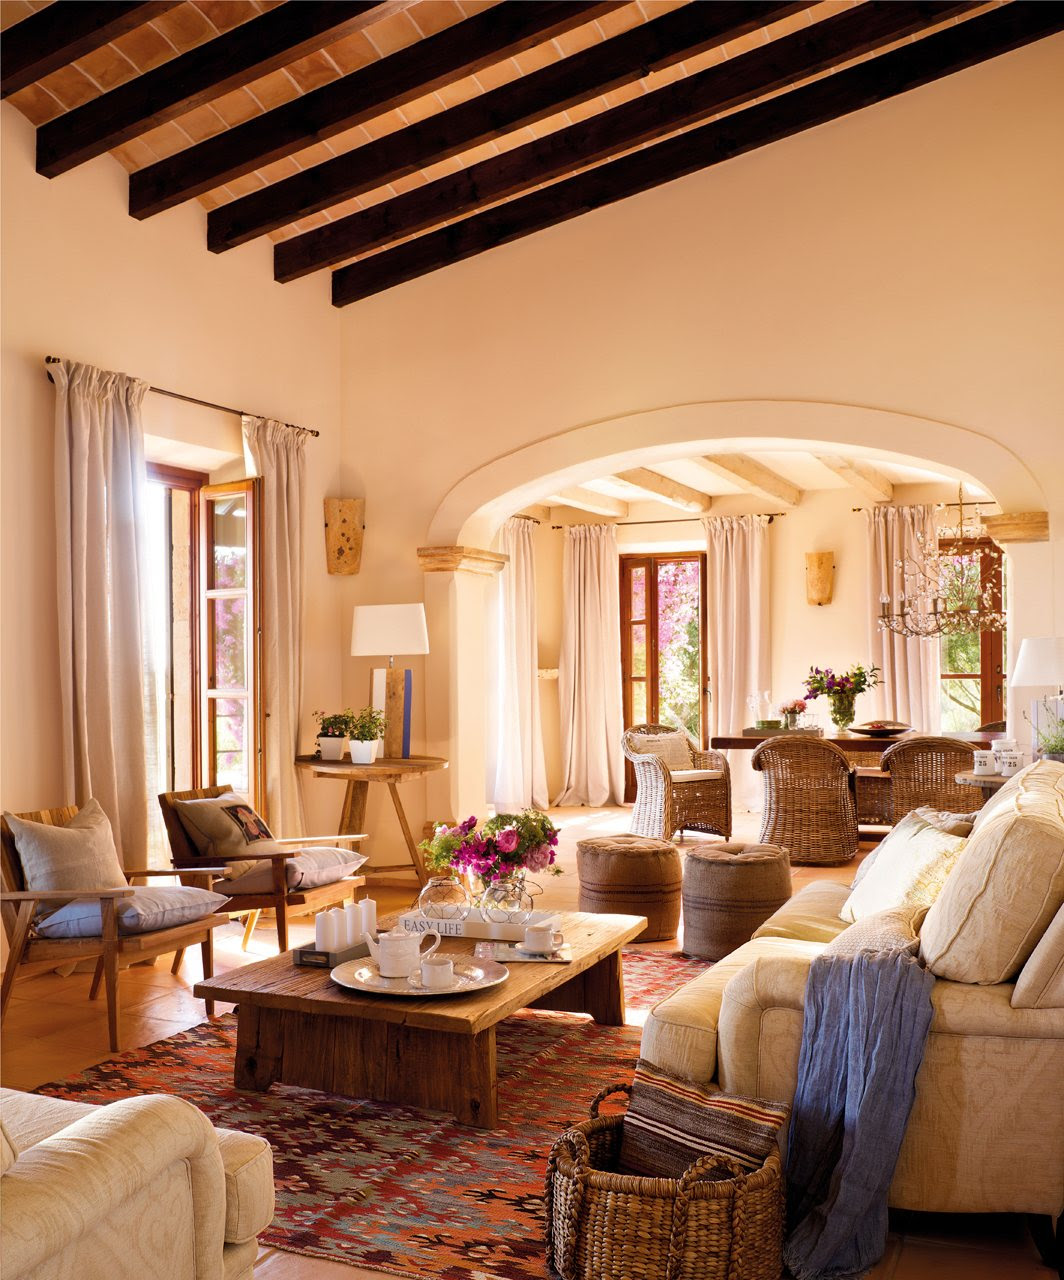 Décor Inspiration : An Apartment in Mallorca, Spain